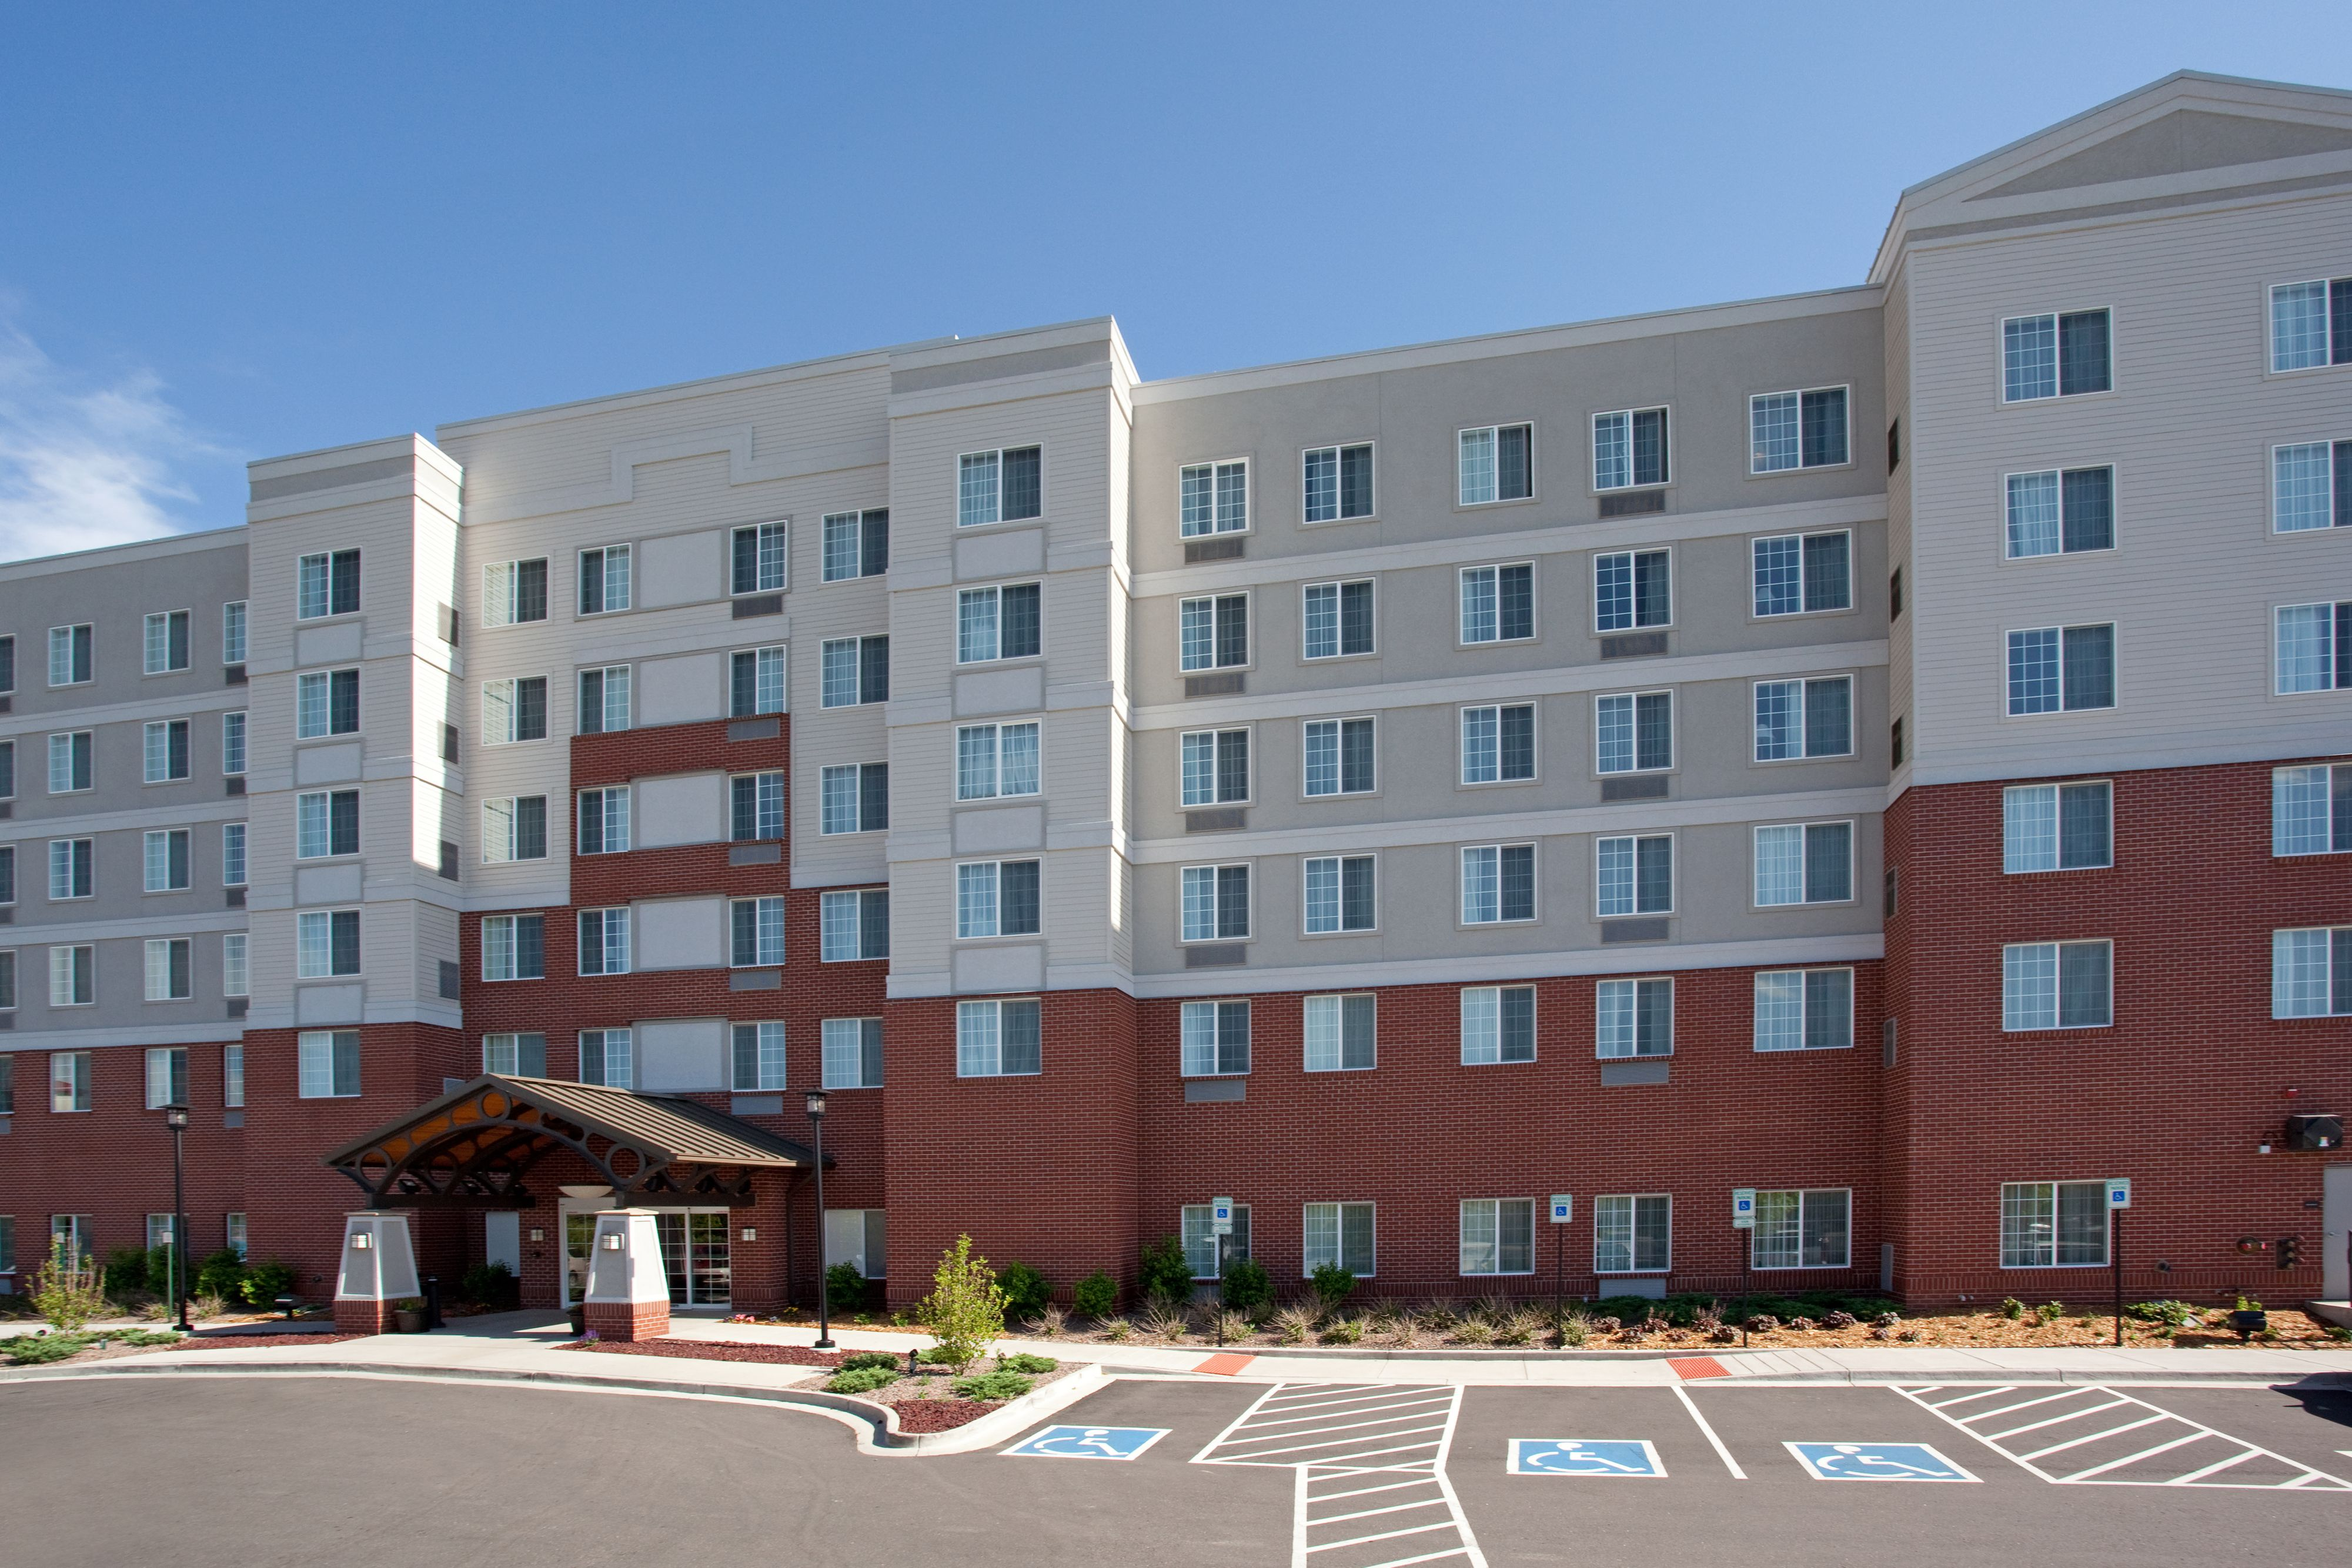 staybridge-suites-denver-2532893775-original.jpg